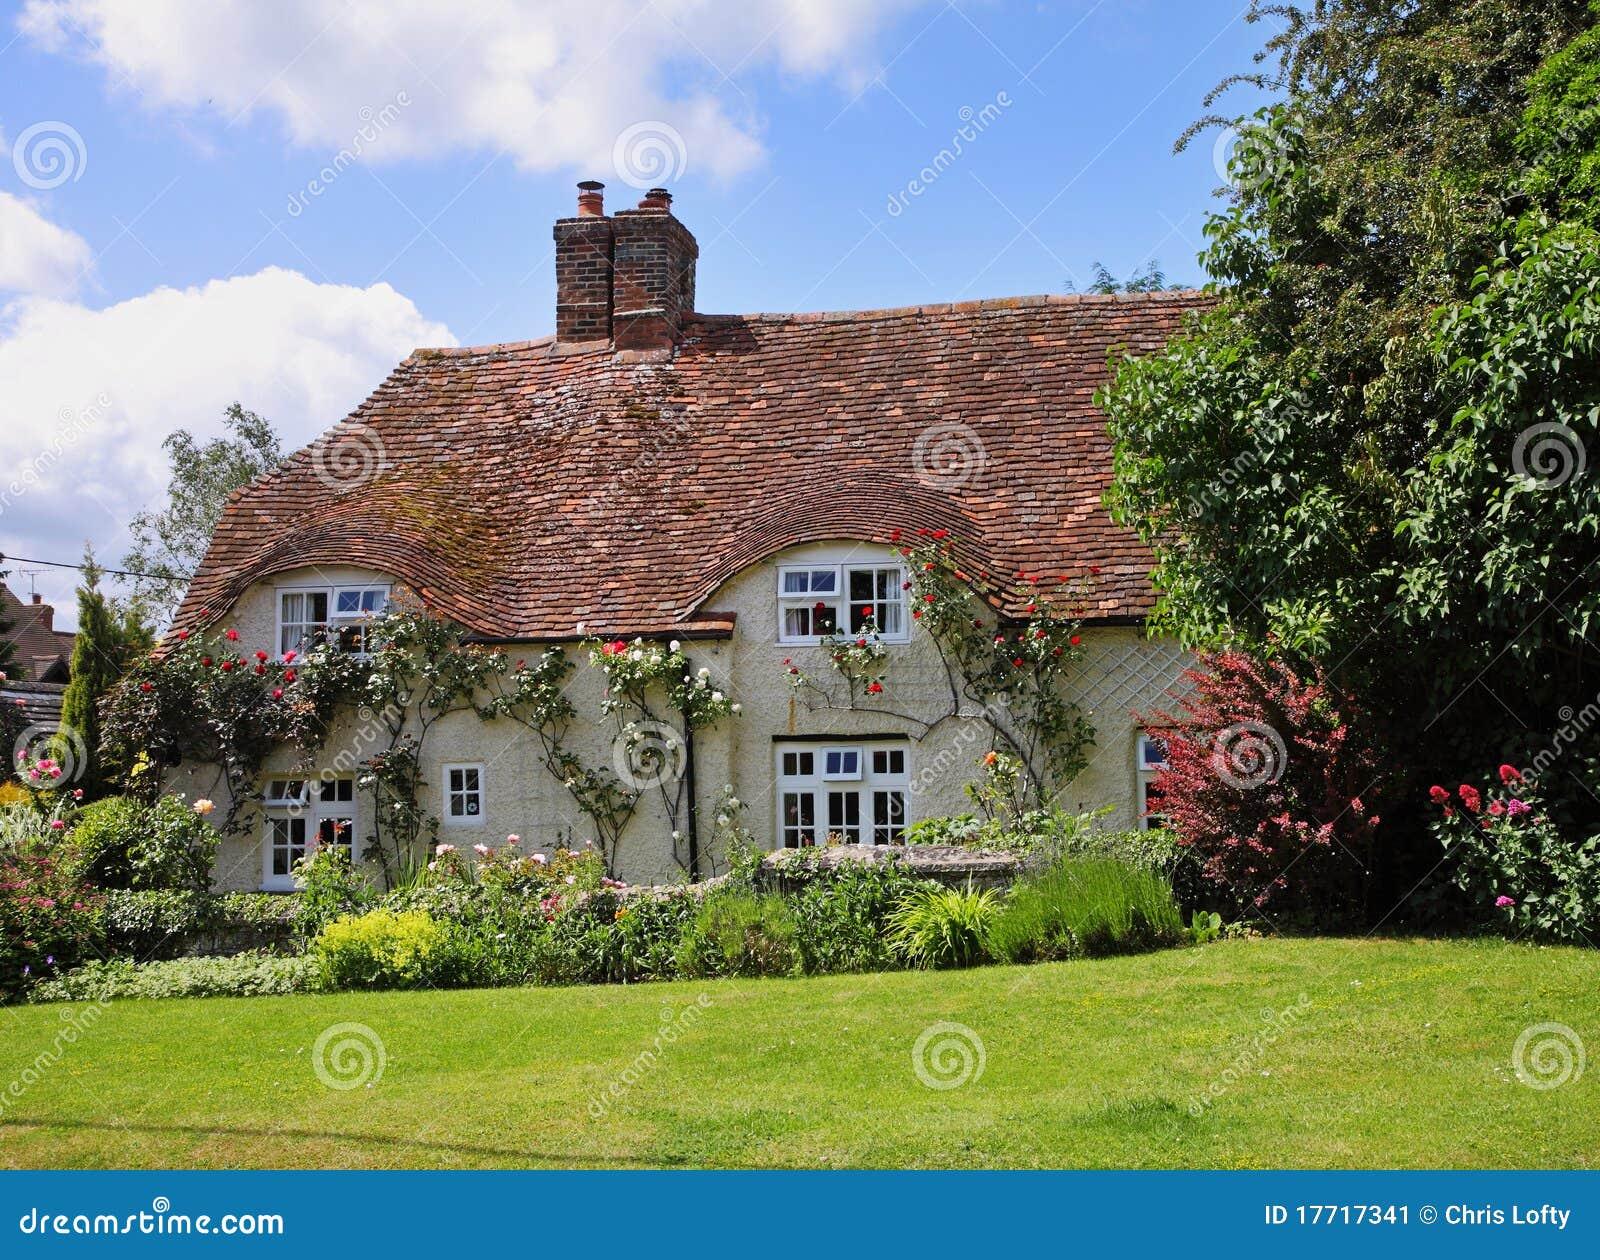 Traditional English Village Cottage Stock Image